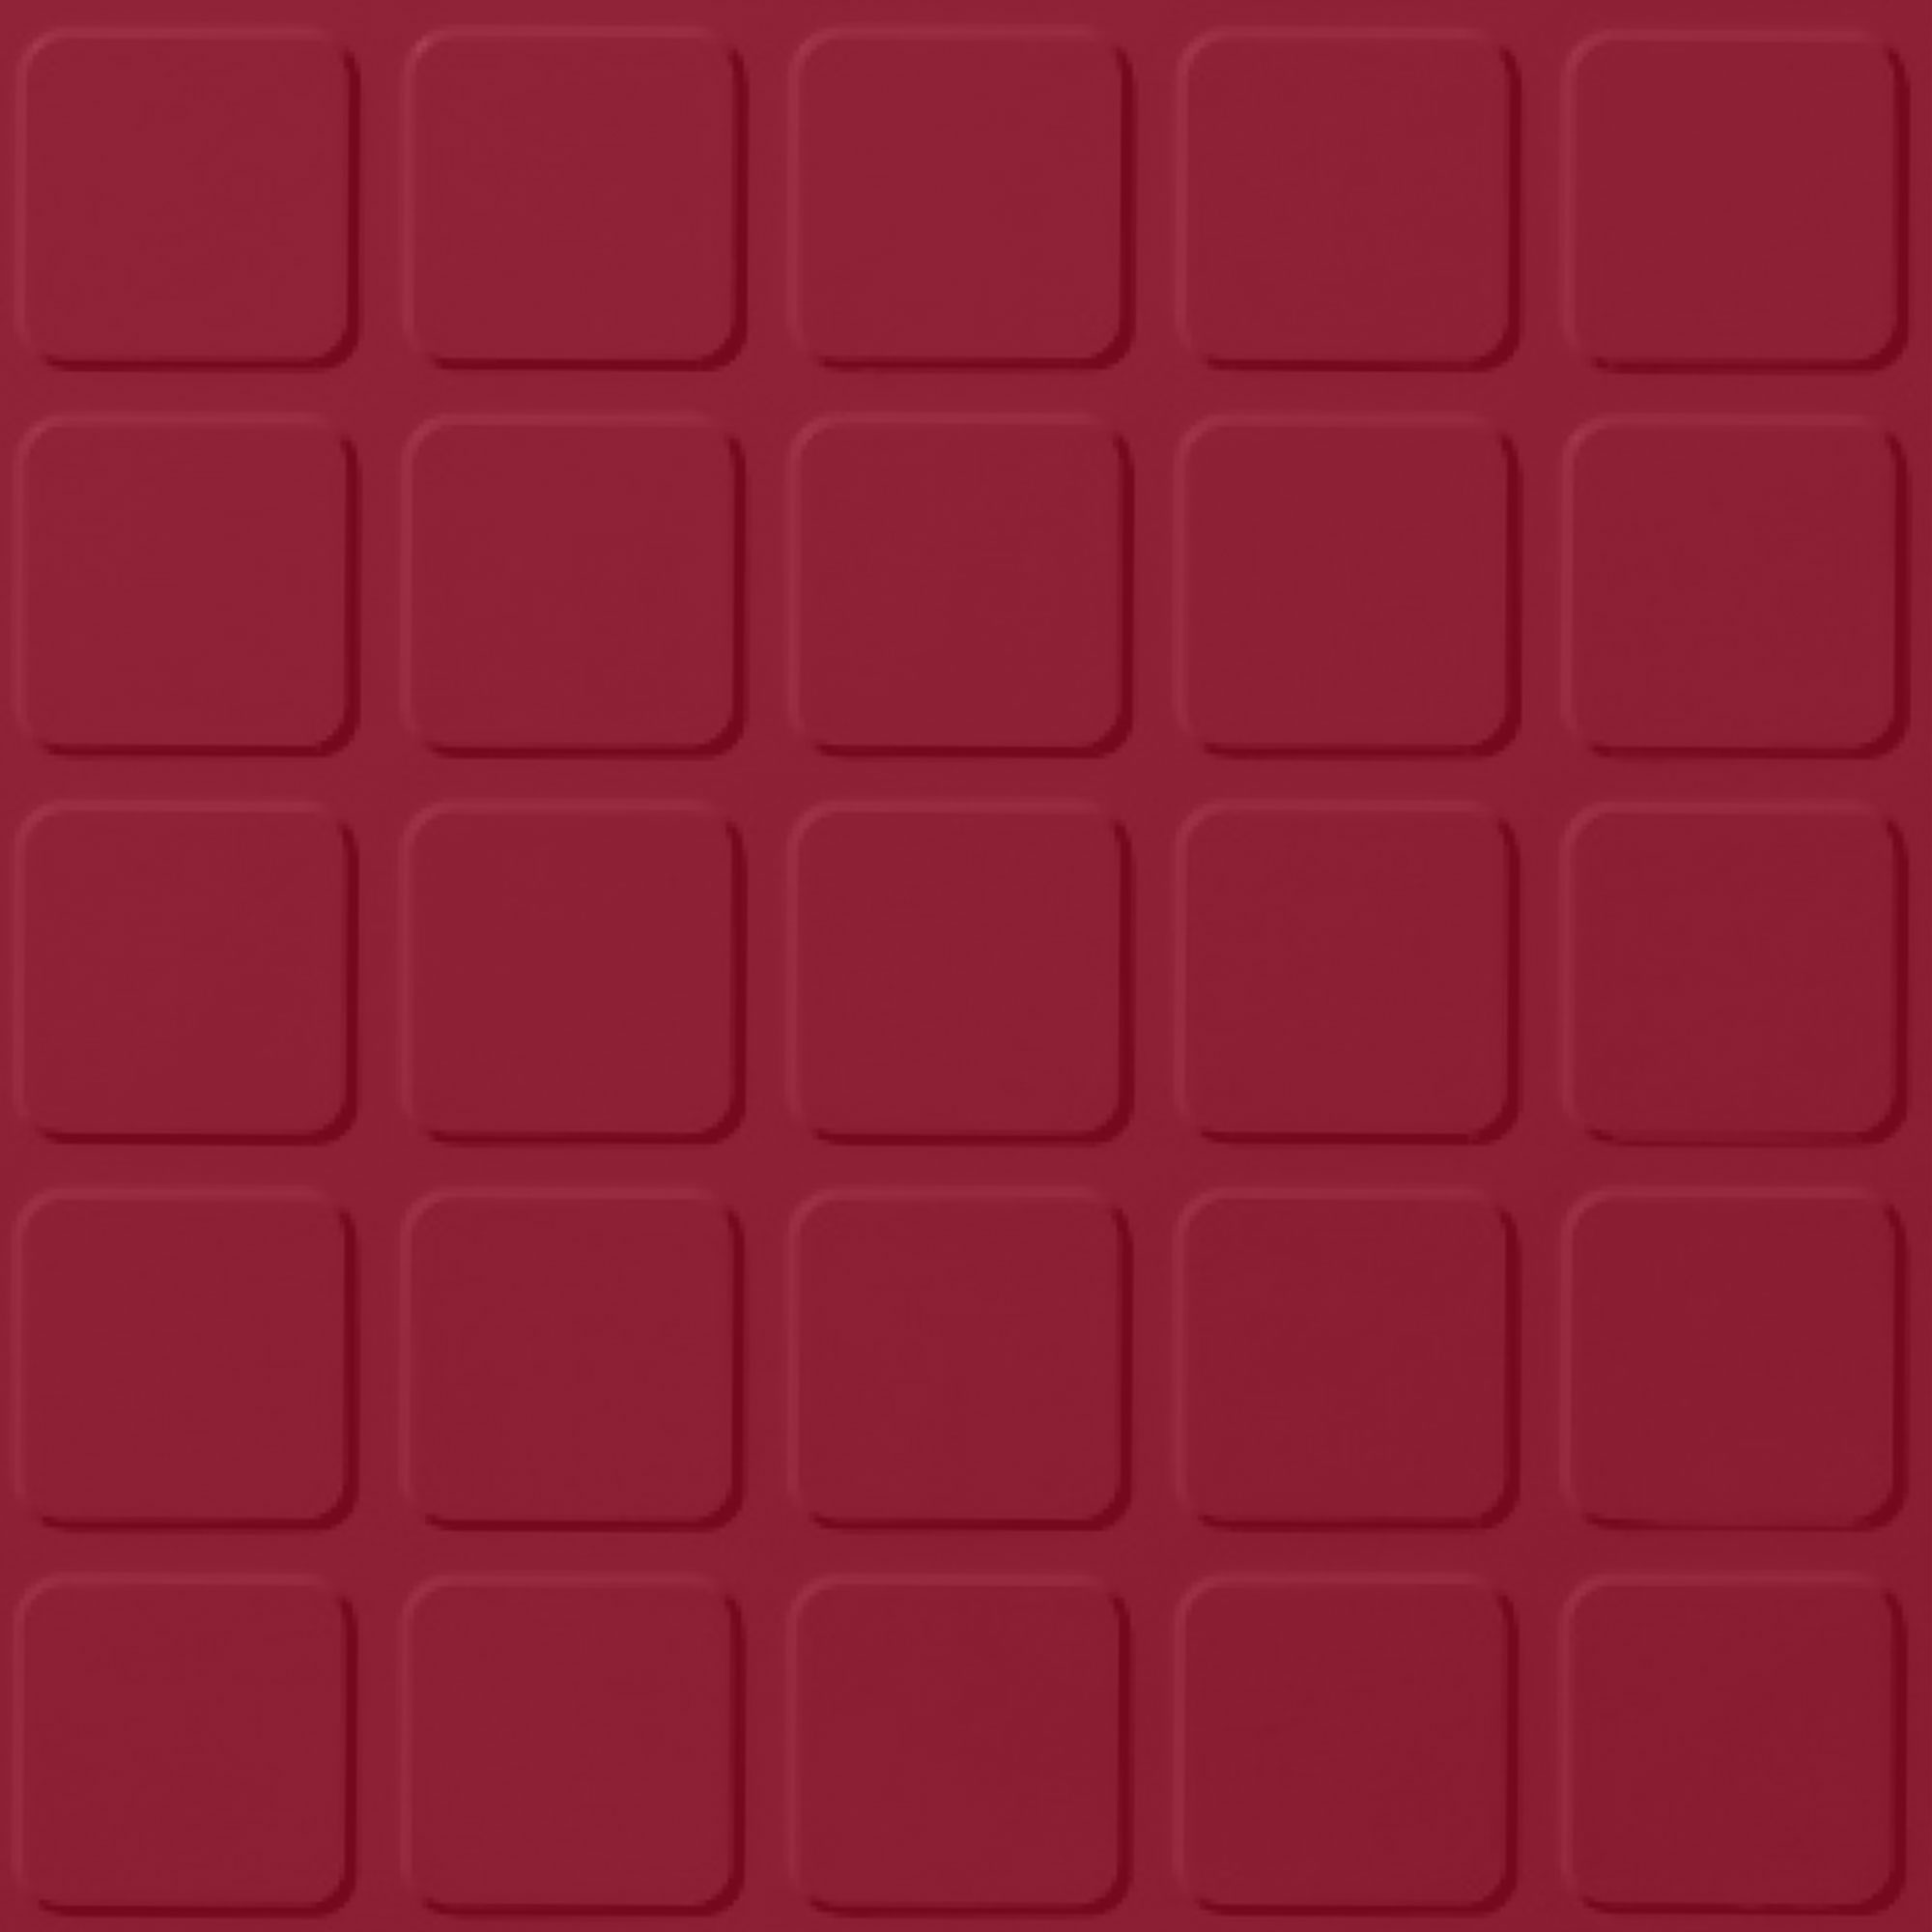 Roppe Rubber Tile 900 - Raised Square Design (994) Red Rubber Flooring